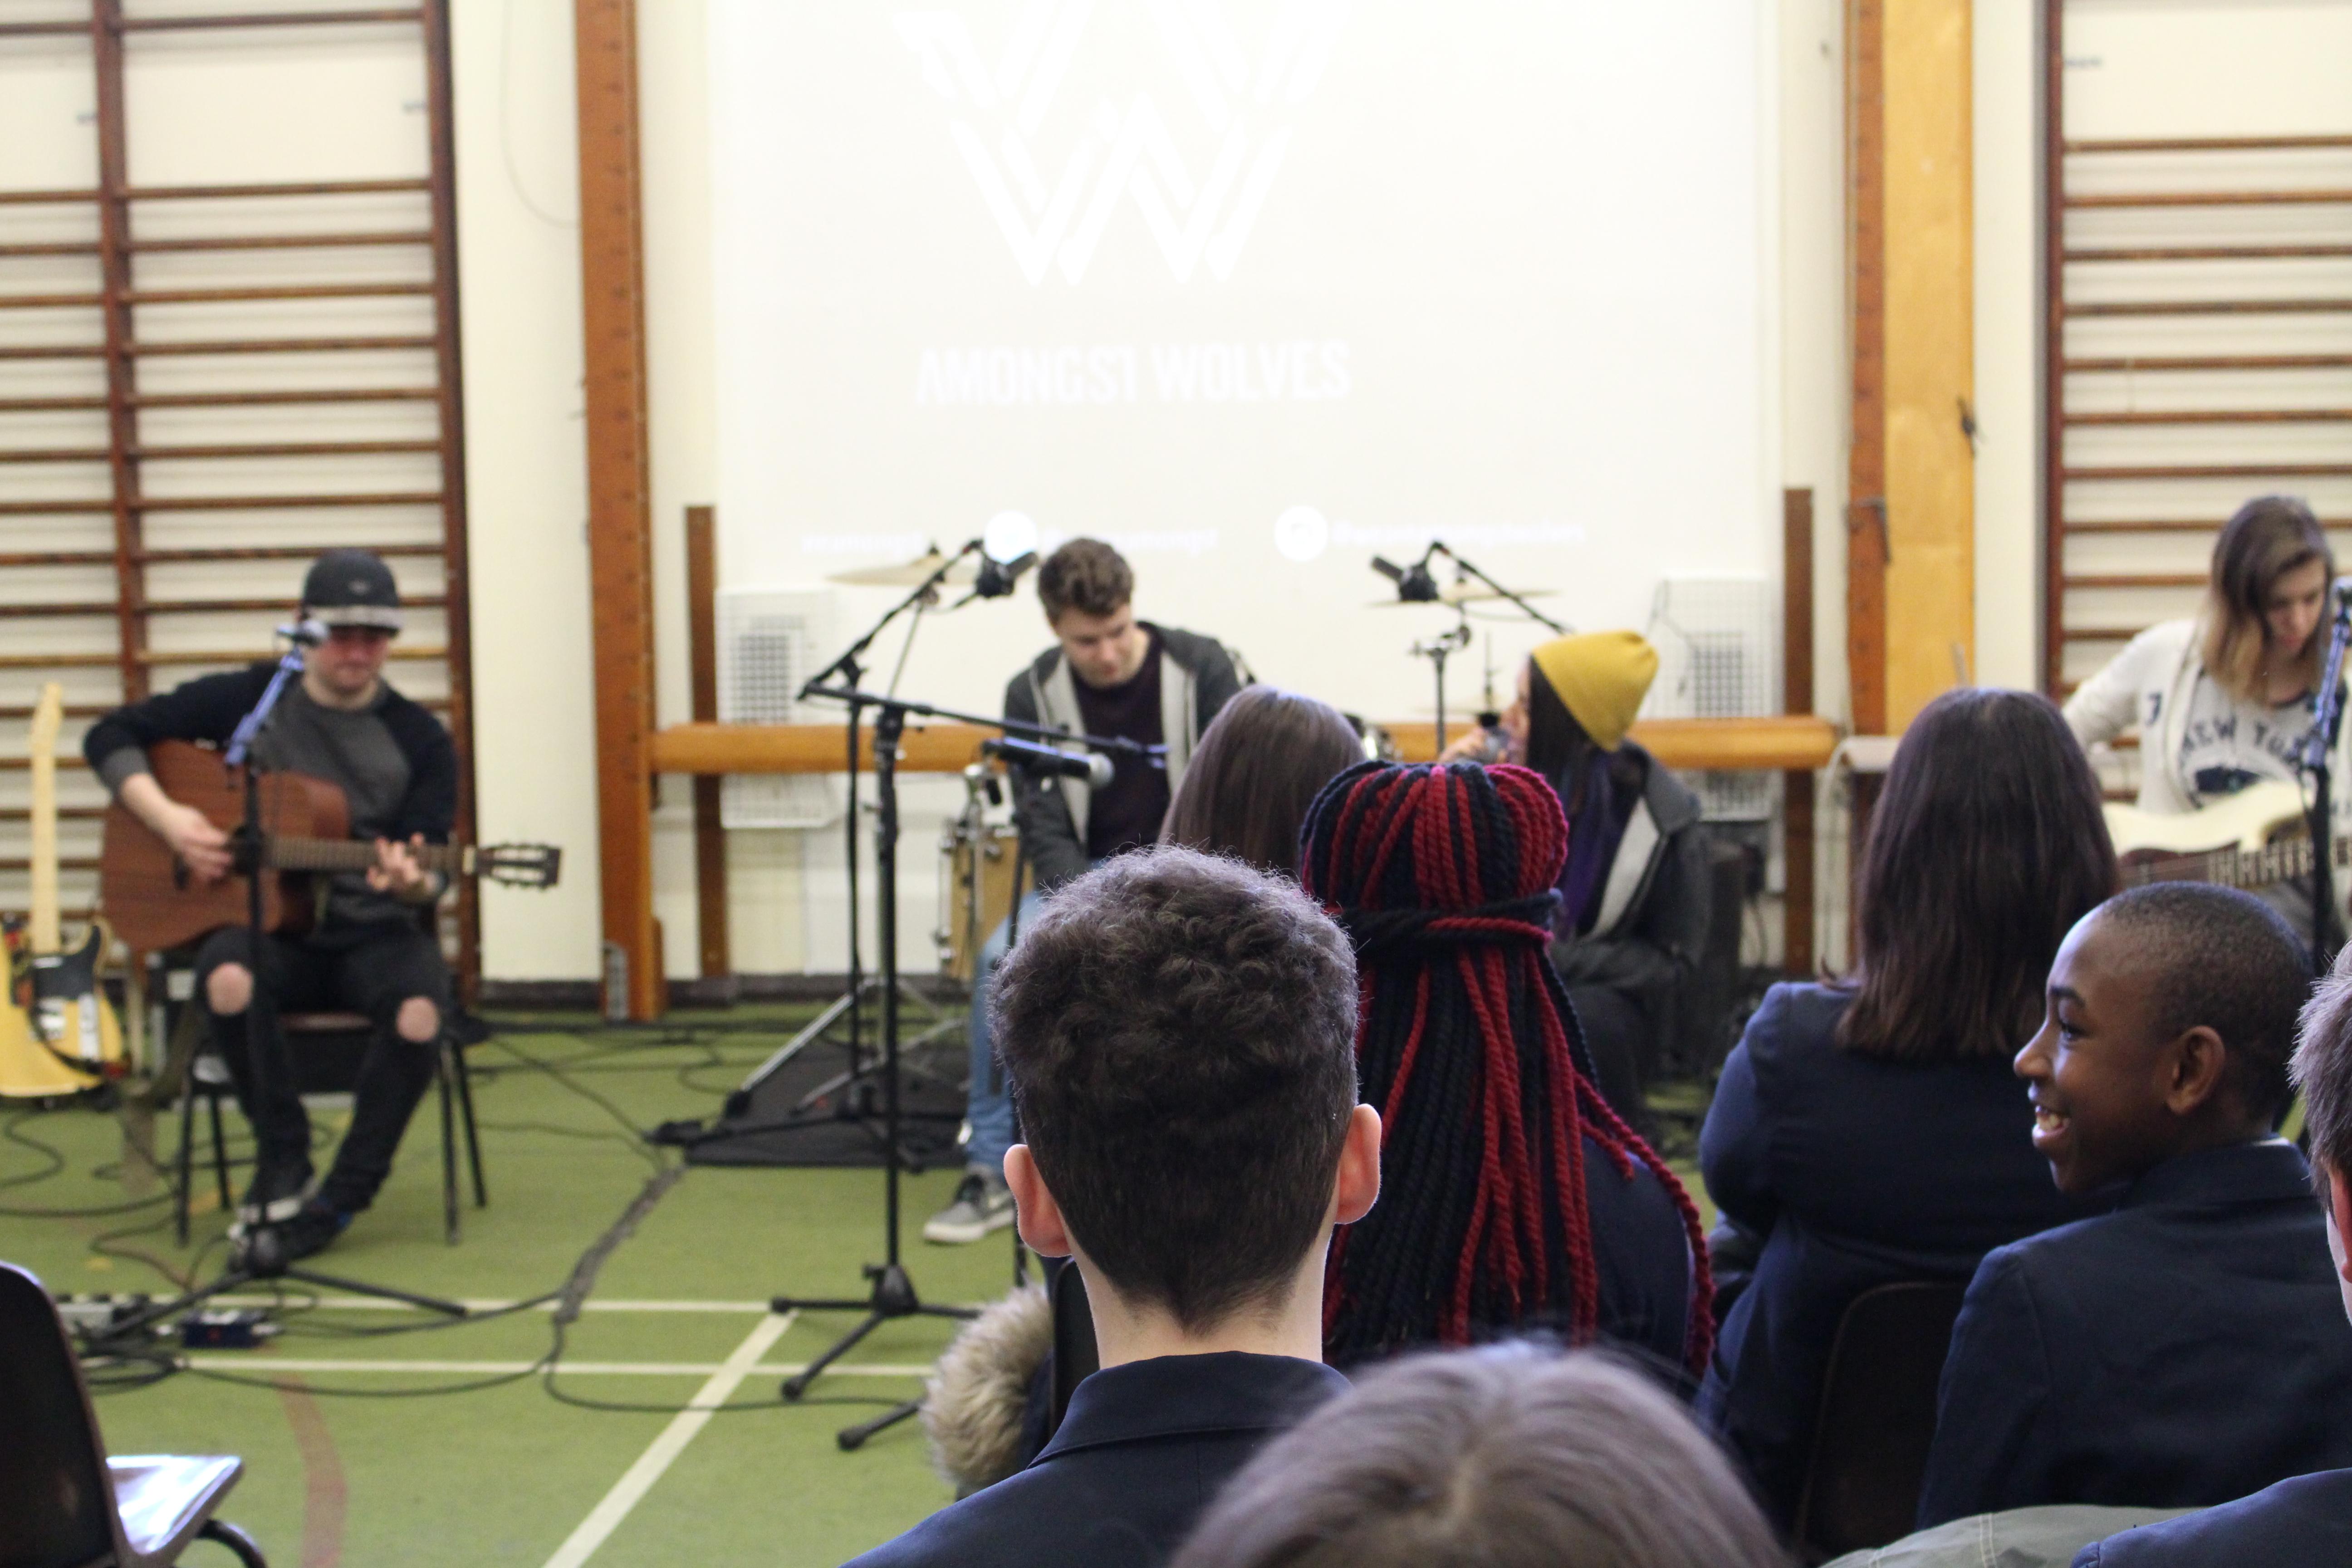 A successful Multi-Faith event